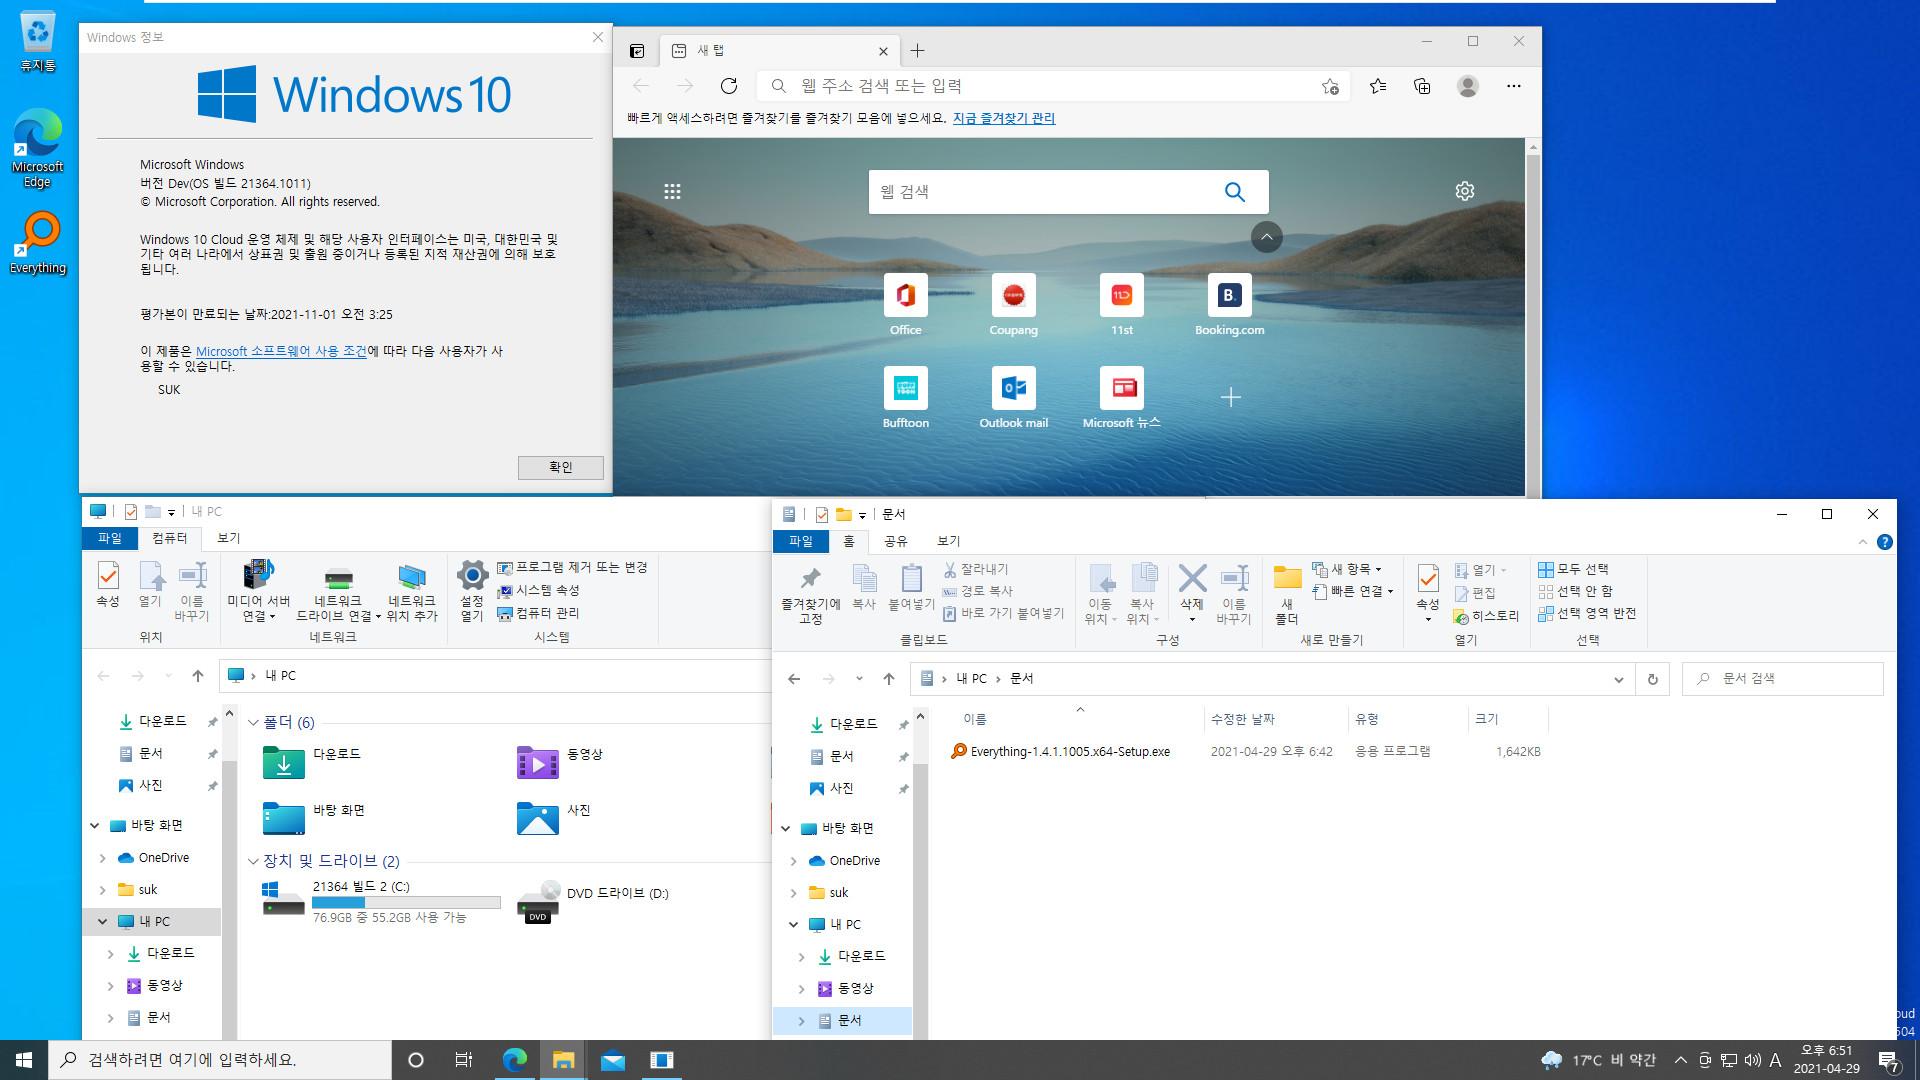 Windows 10 인사이더 프리뷰 버전 Dev (버전 21H2 예상) 21364 빌드에 Cloud Edition 설치 + Pro와 전환 테스트 = 잘 전환됩니다 2021-04-29_185141.jpg